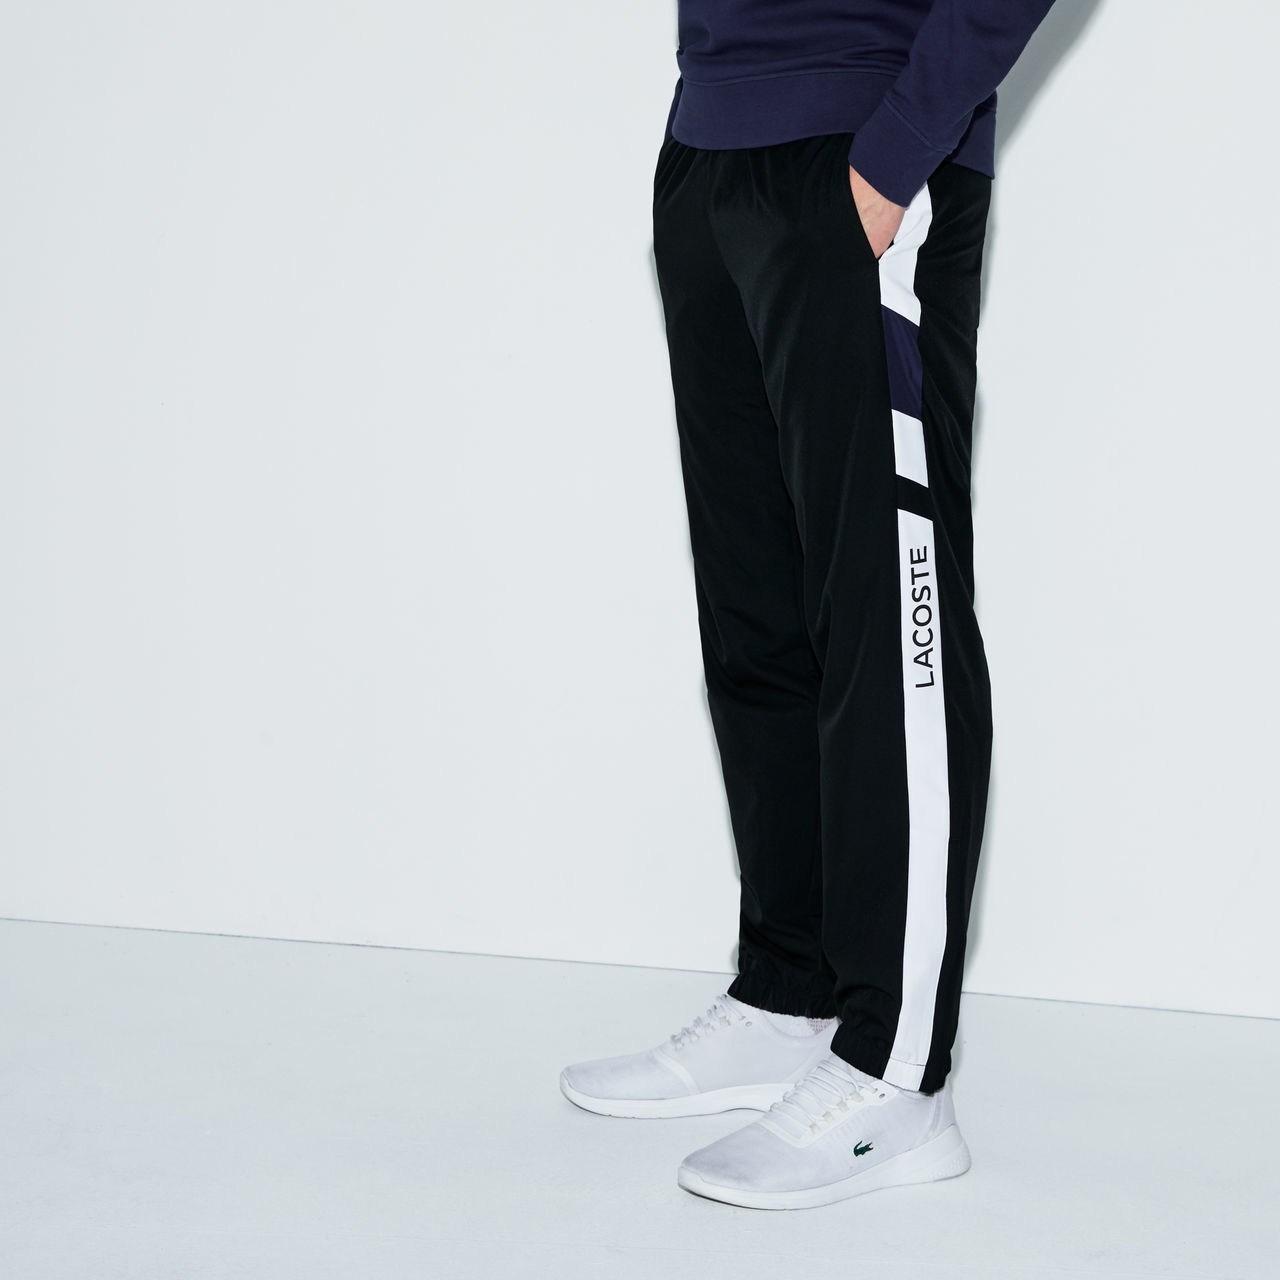 Blackwhite Tennis Pantalon Lacoste De Inkwell Survêtement zVqUMjpGLS